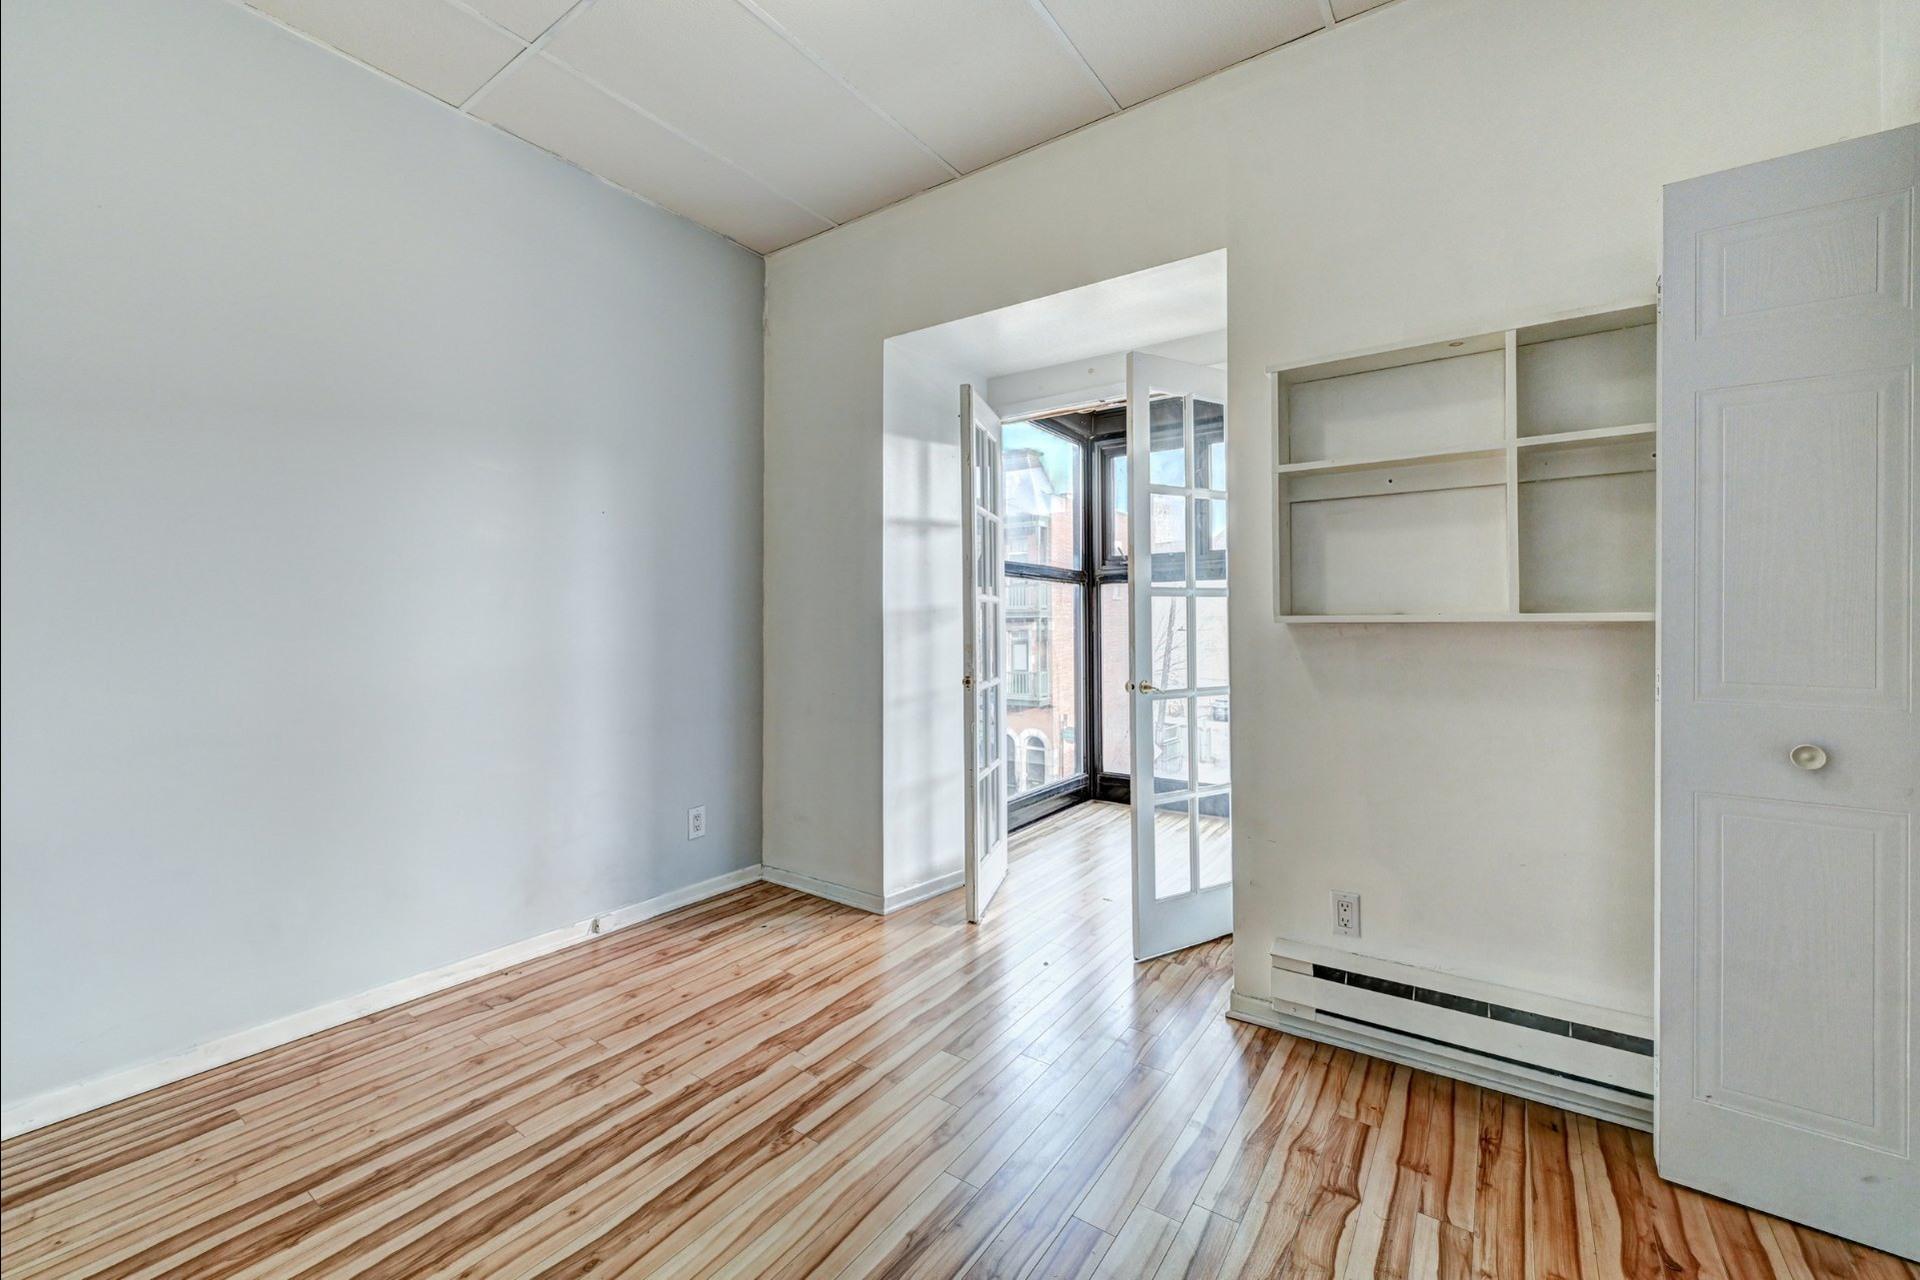 image 5 - Departamento Para alquiler Ville-Marie Montréal  - 4 habitaciones